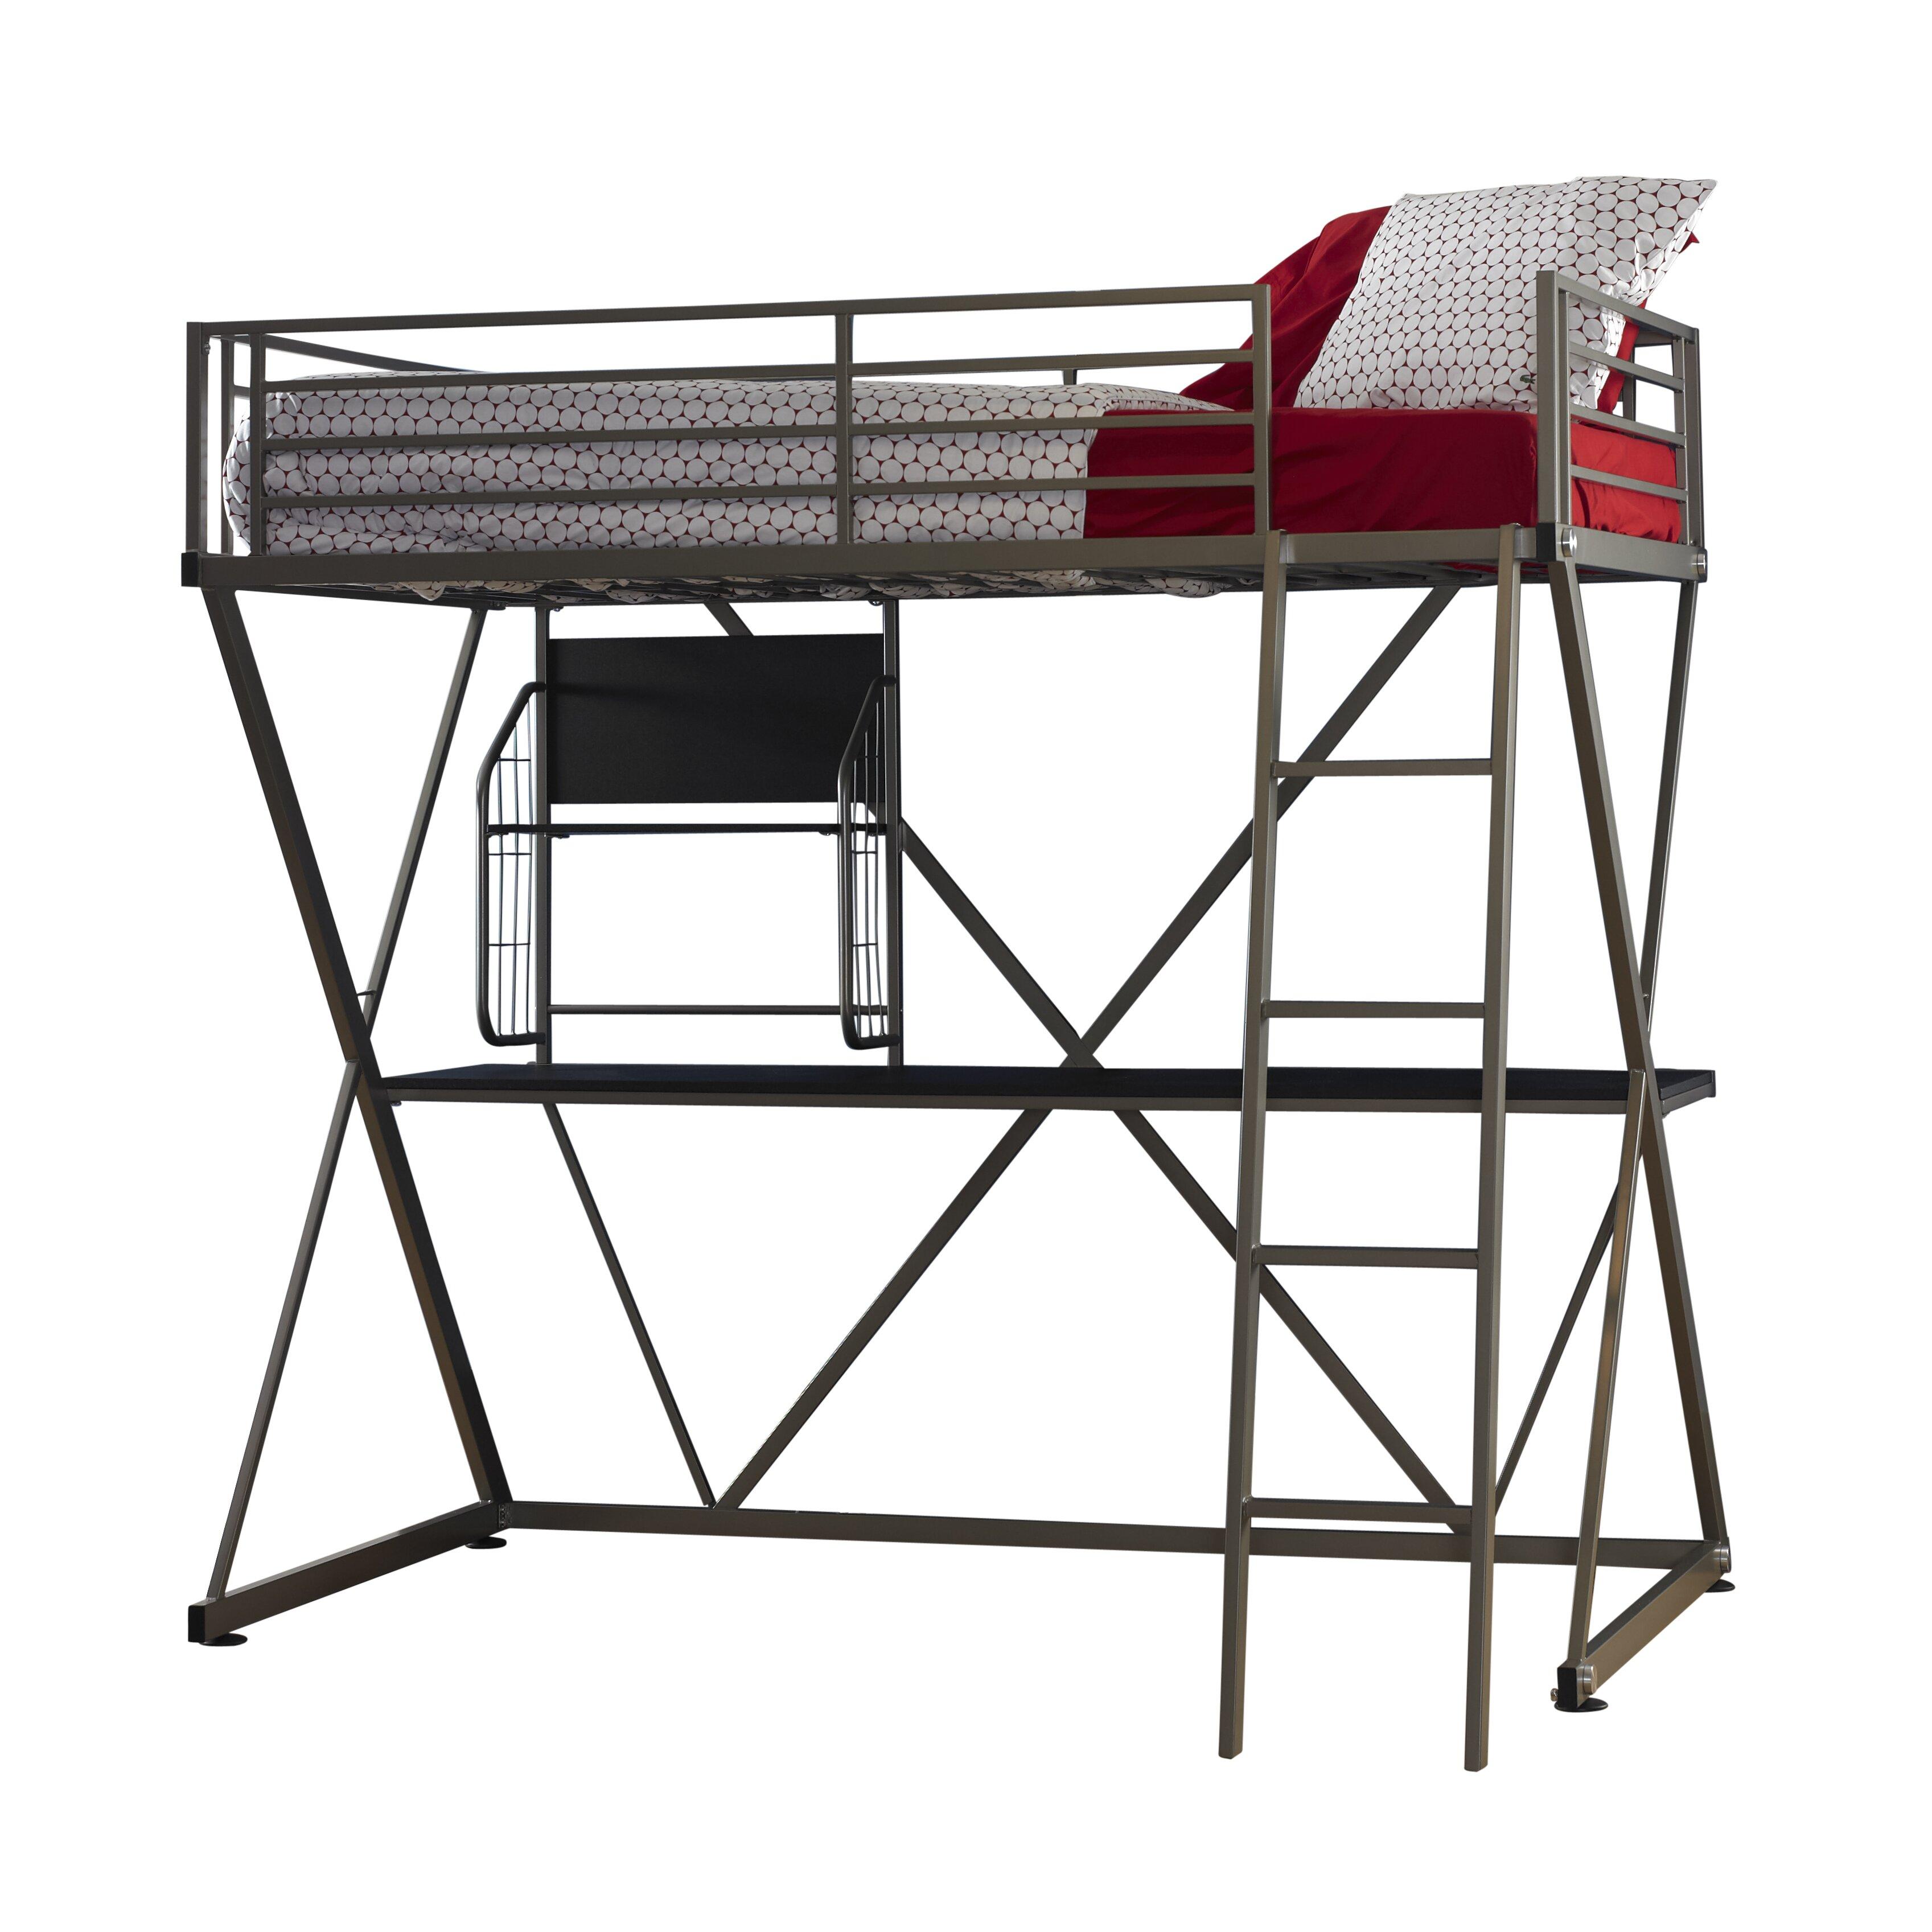 Powell z bedroom twin loft bed reviews wayfair for Powell z bedroom furniture